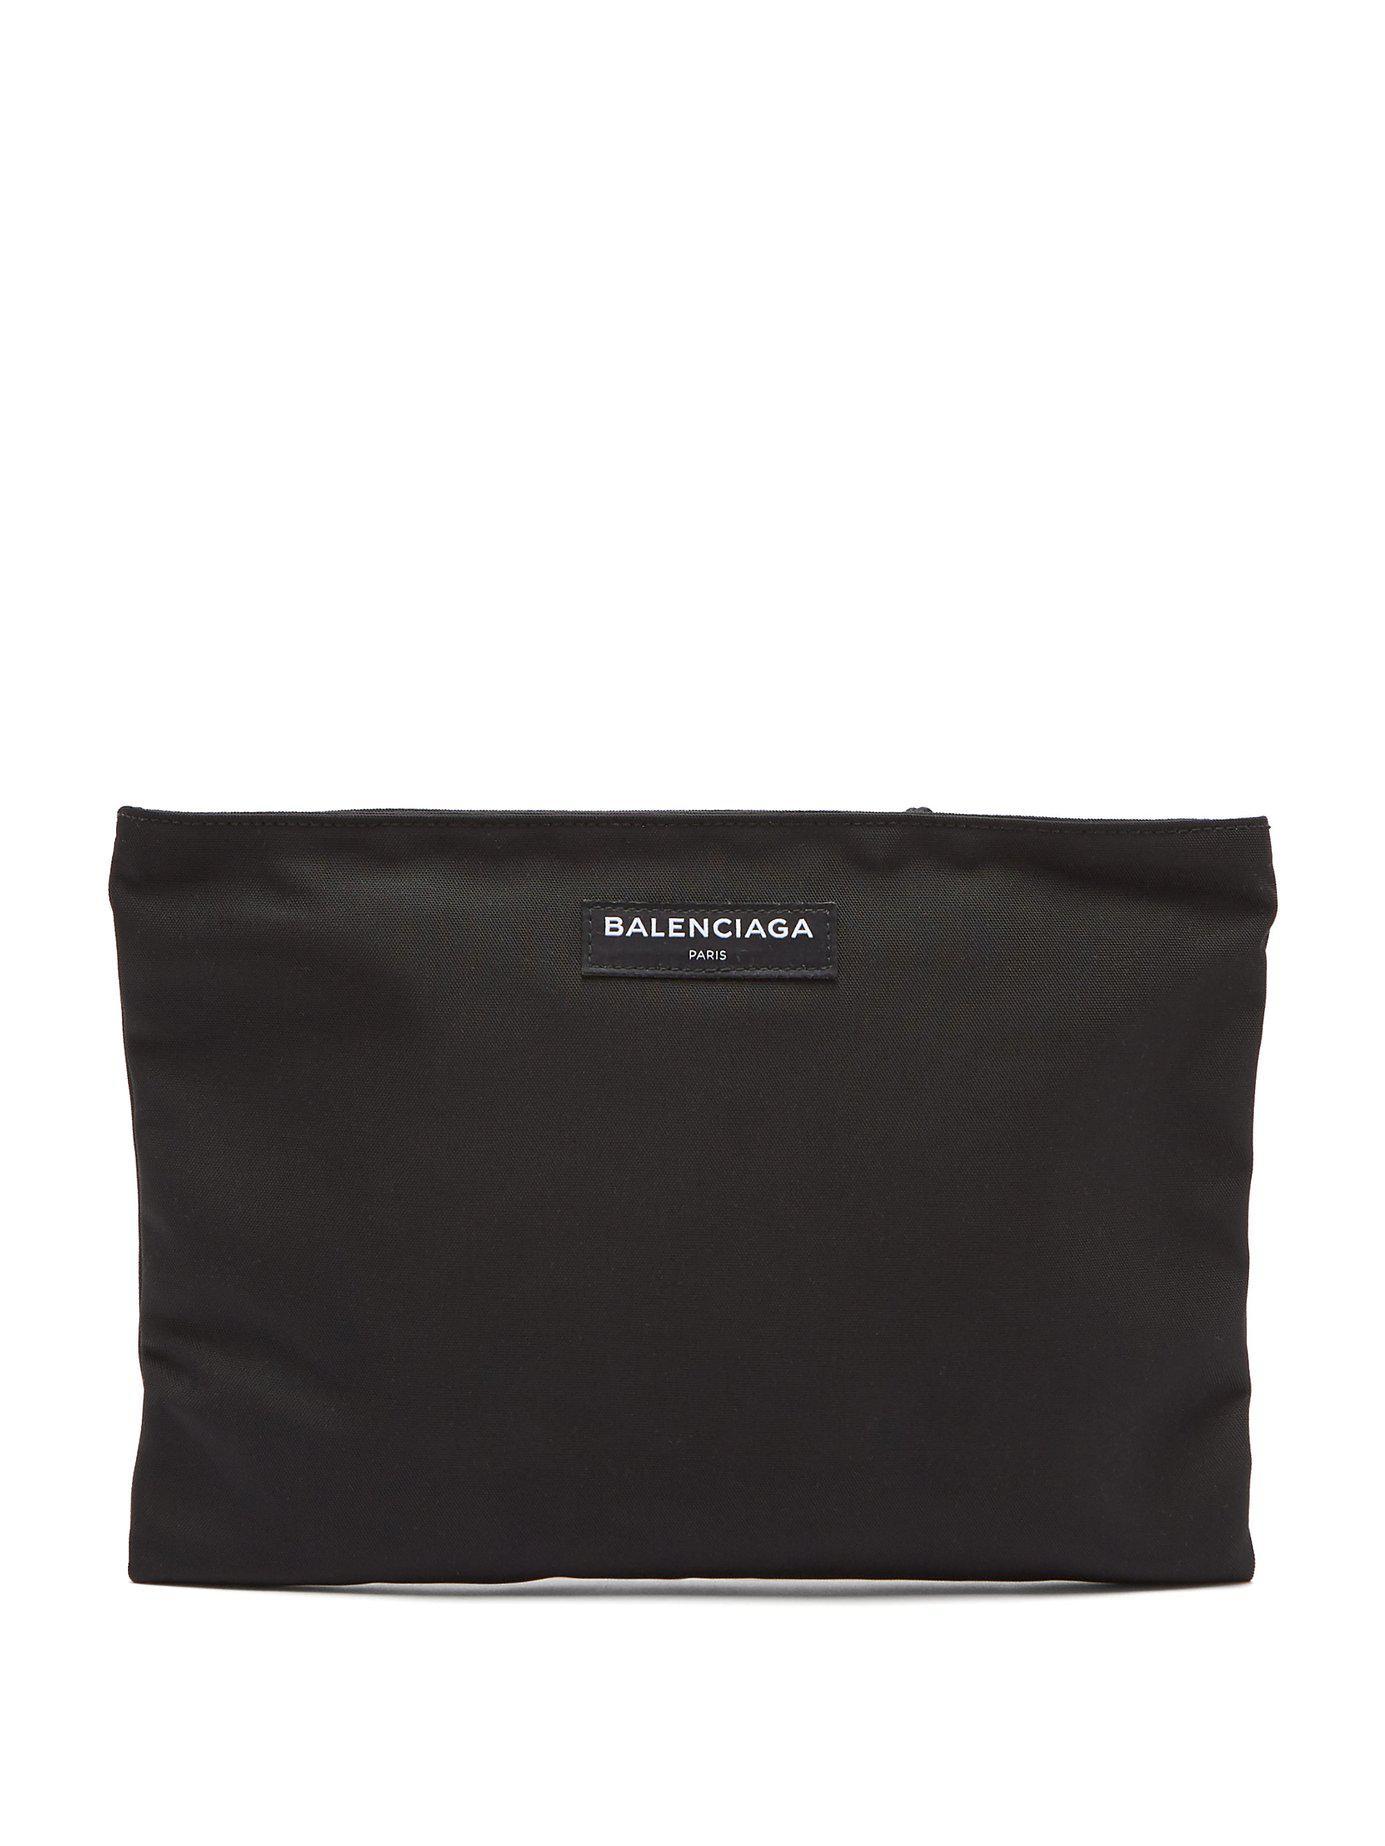 Balenciaga Pochette en toile Explorer b2GDWn